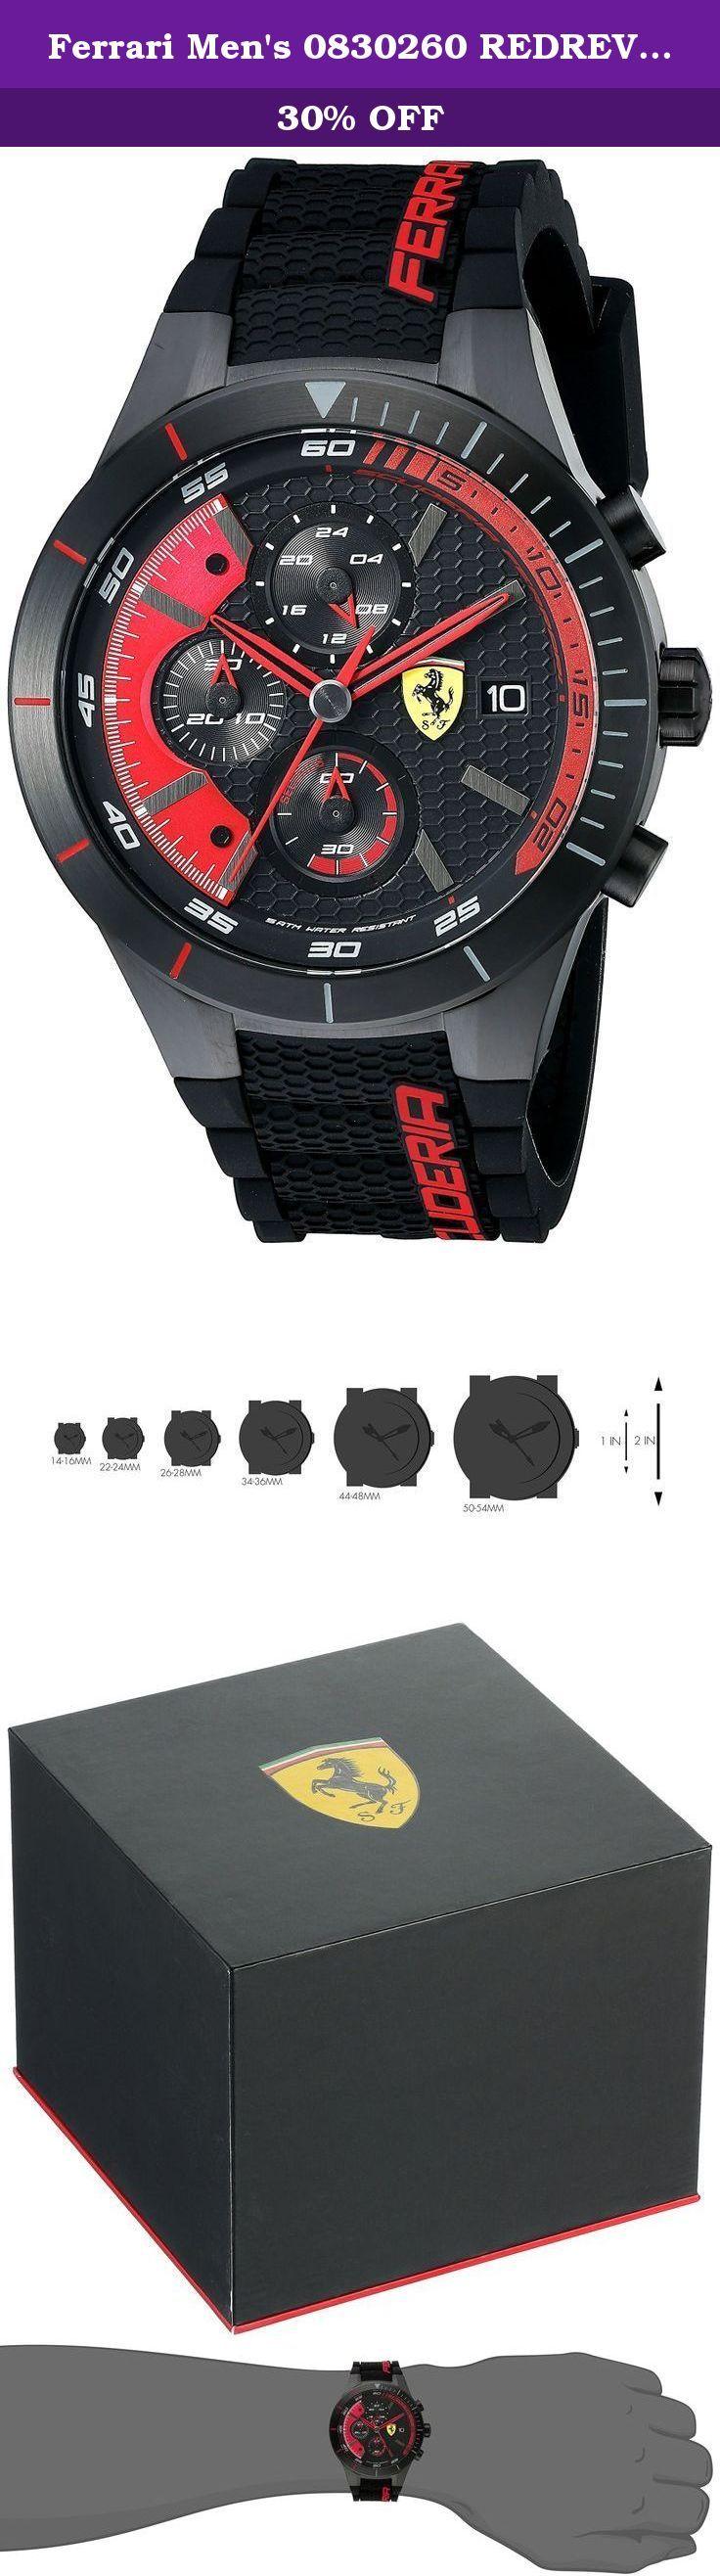 ferrari mens 0830260 redrev evo analog display quartz black watch red rev captures the thrill